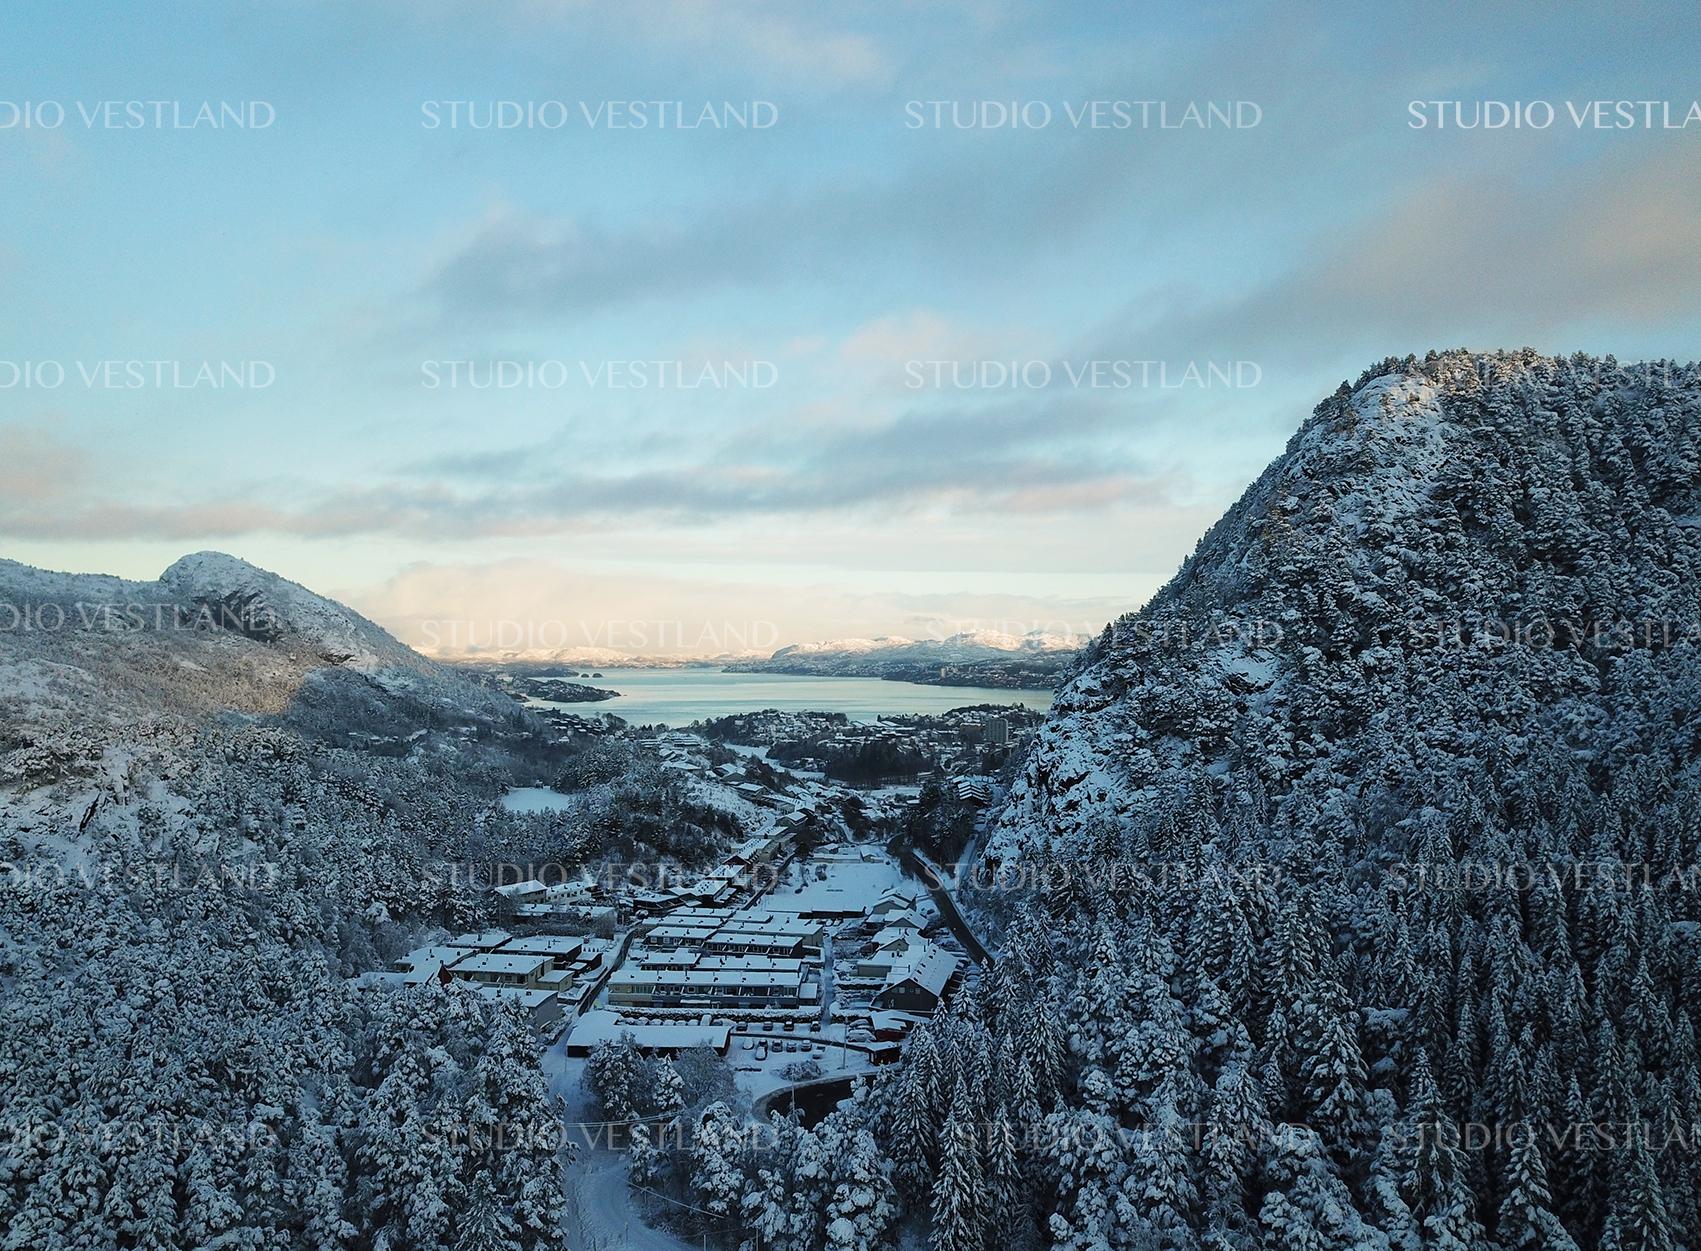 Studio Vestland - Nipedalen 04